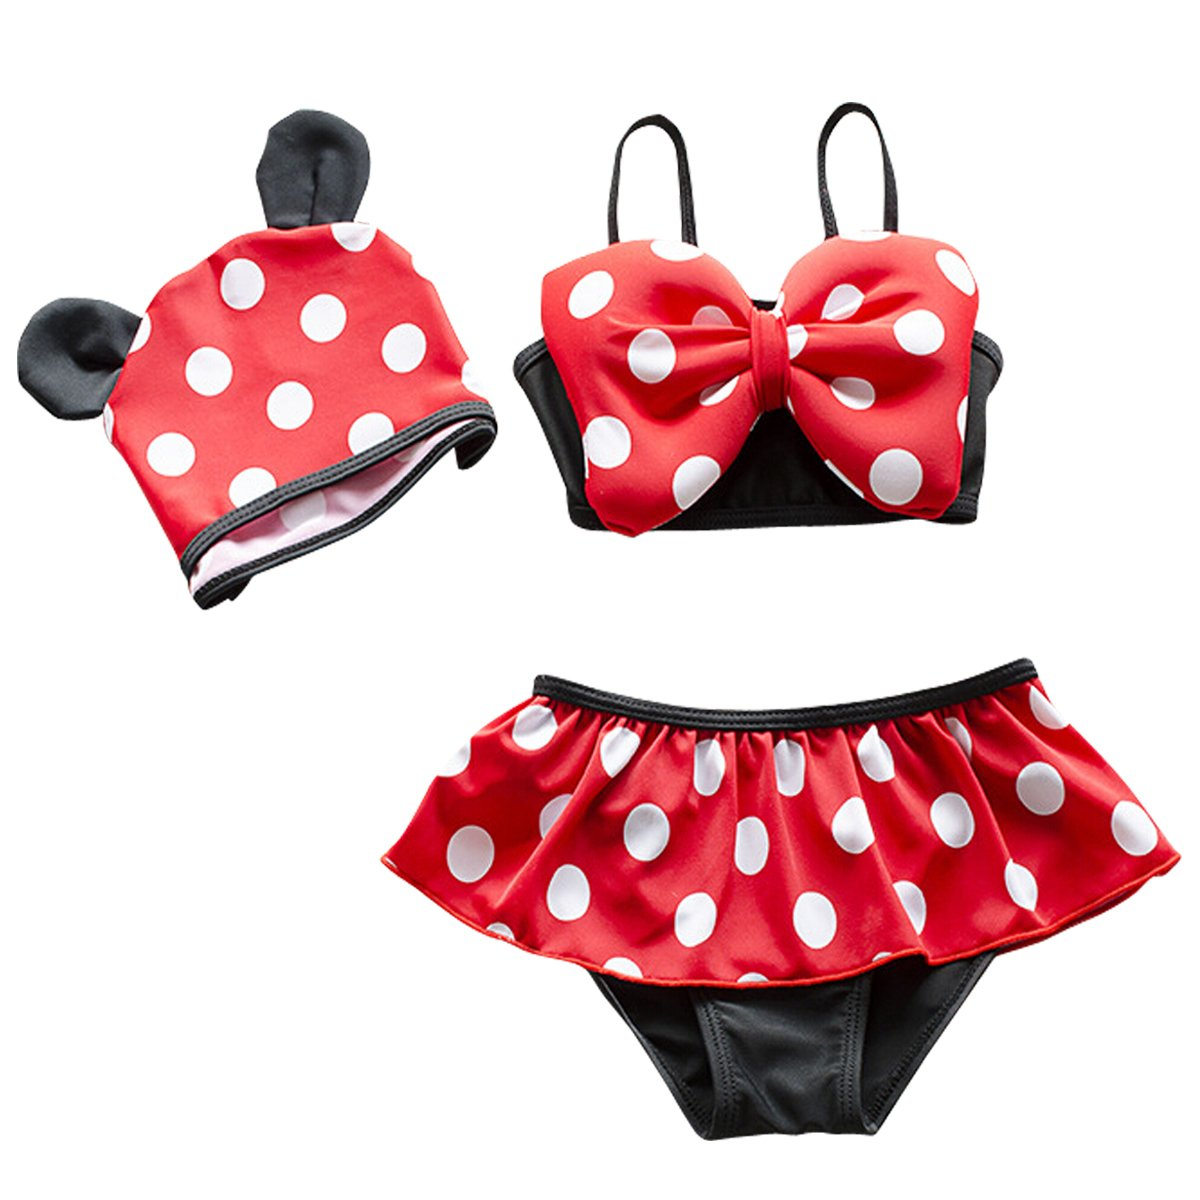 Jastore® 3pcs Baby Girls Swimwear Cute Polka Dots Bikini Set Swimsuit (L/4-5T) 4048908221